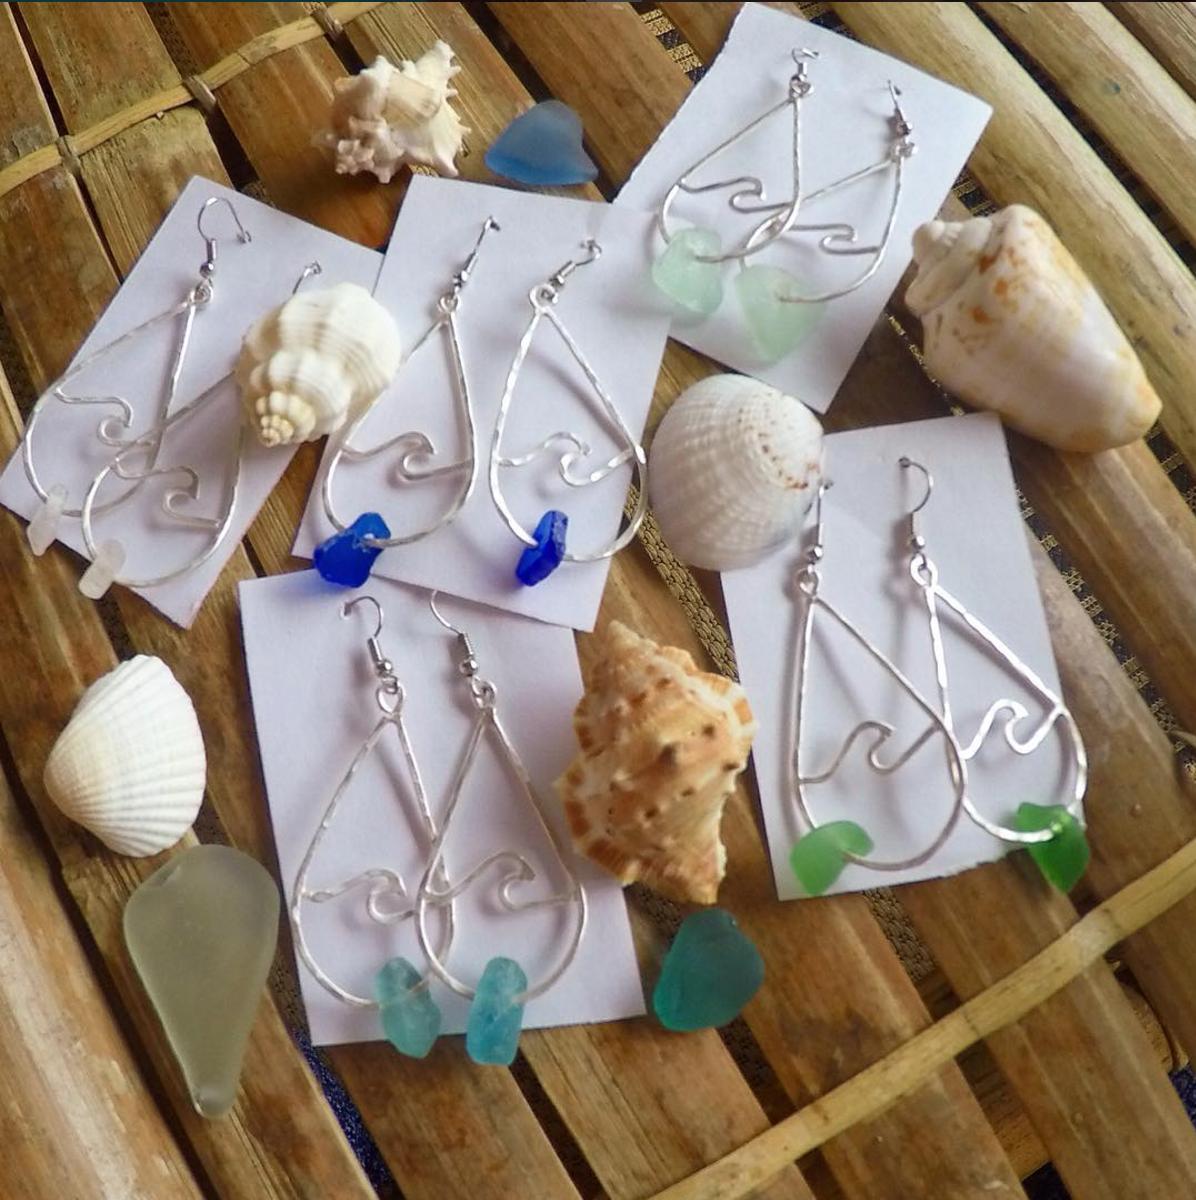 seaglass-earrings.png